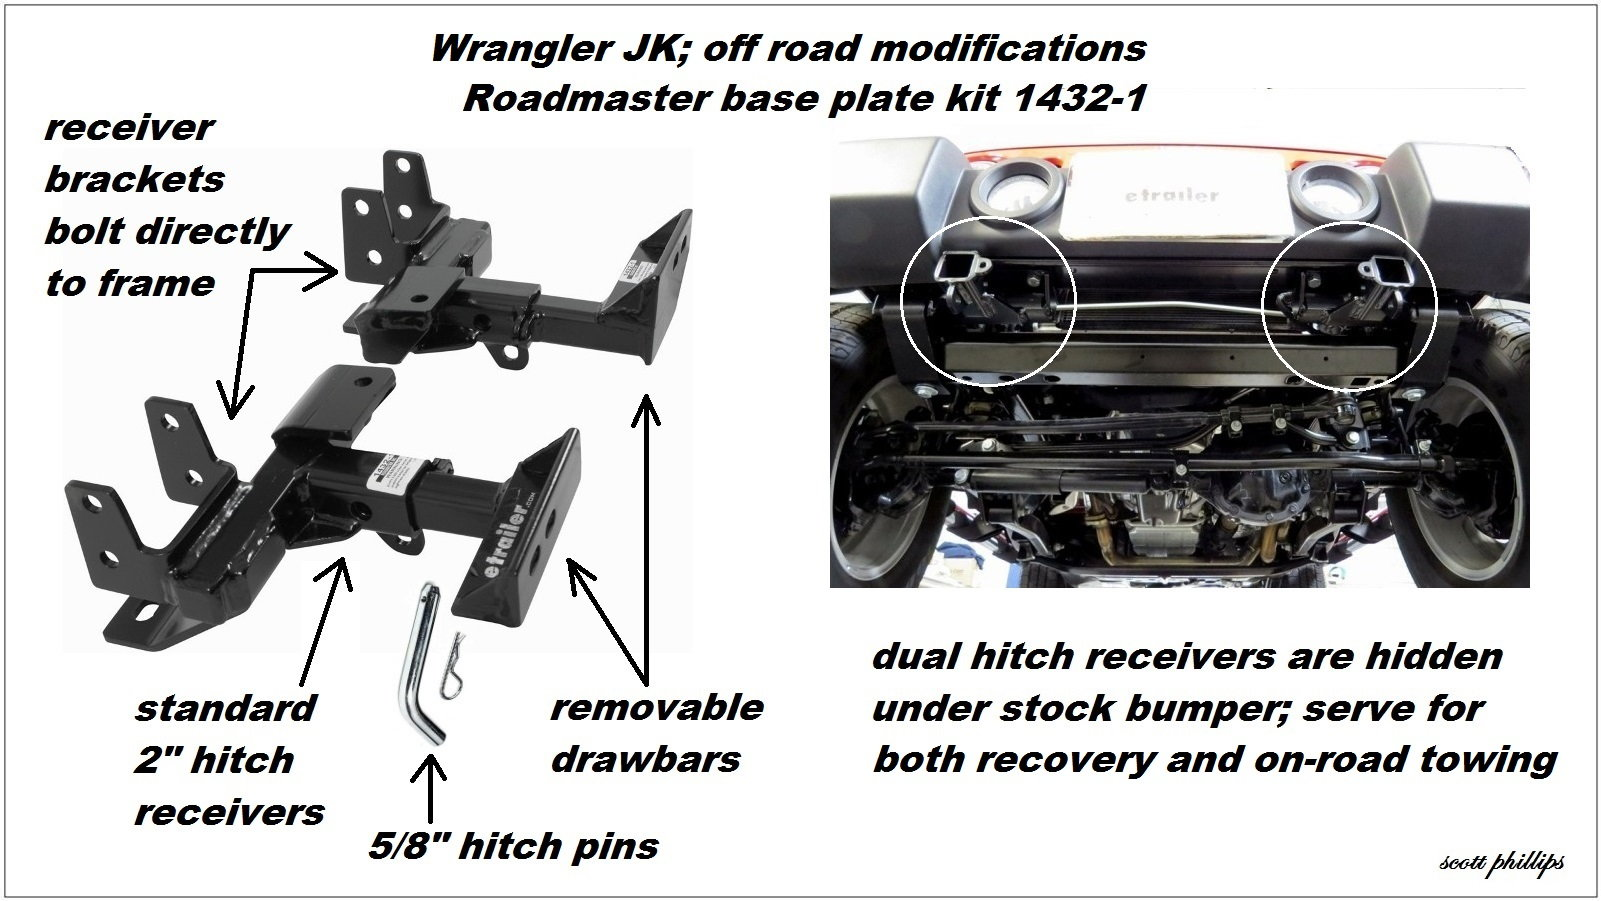 Jeep Wrangler JK 2007 to present Off-Road Modifications